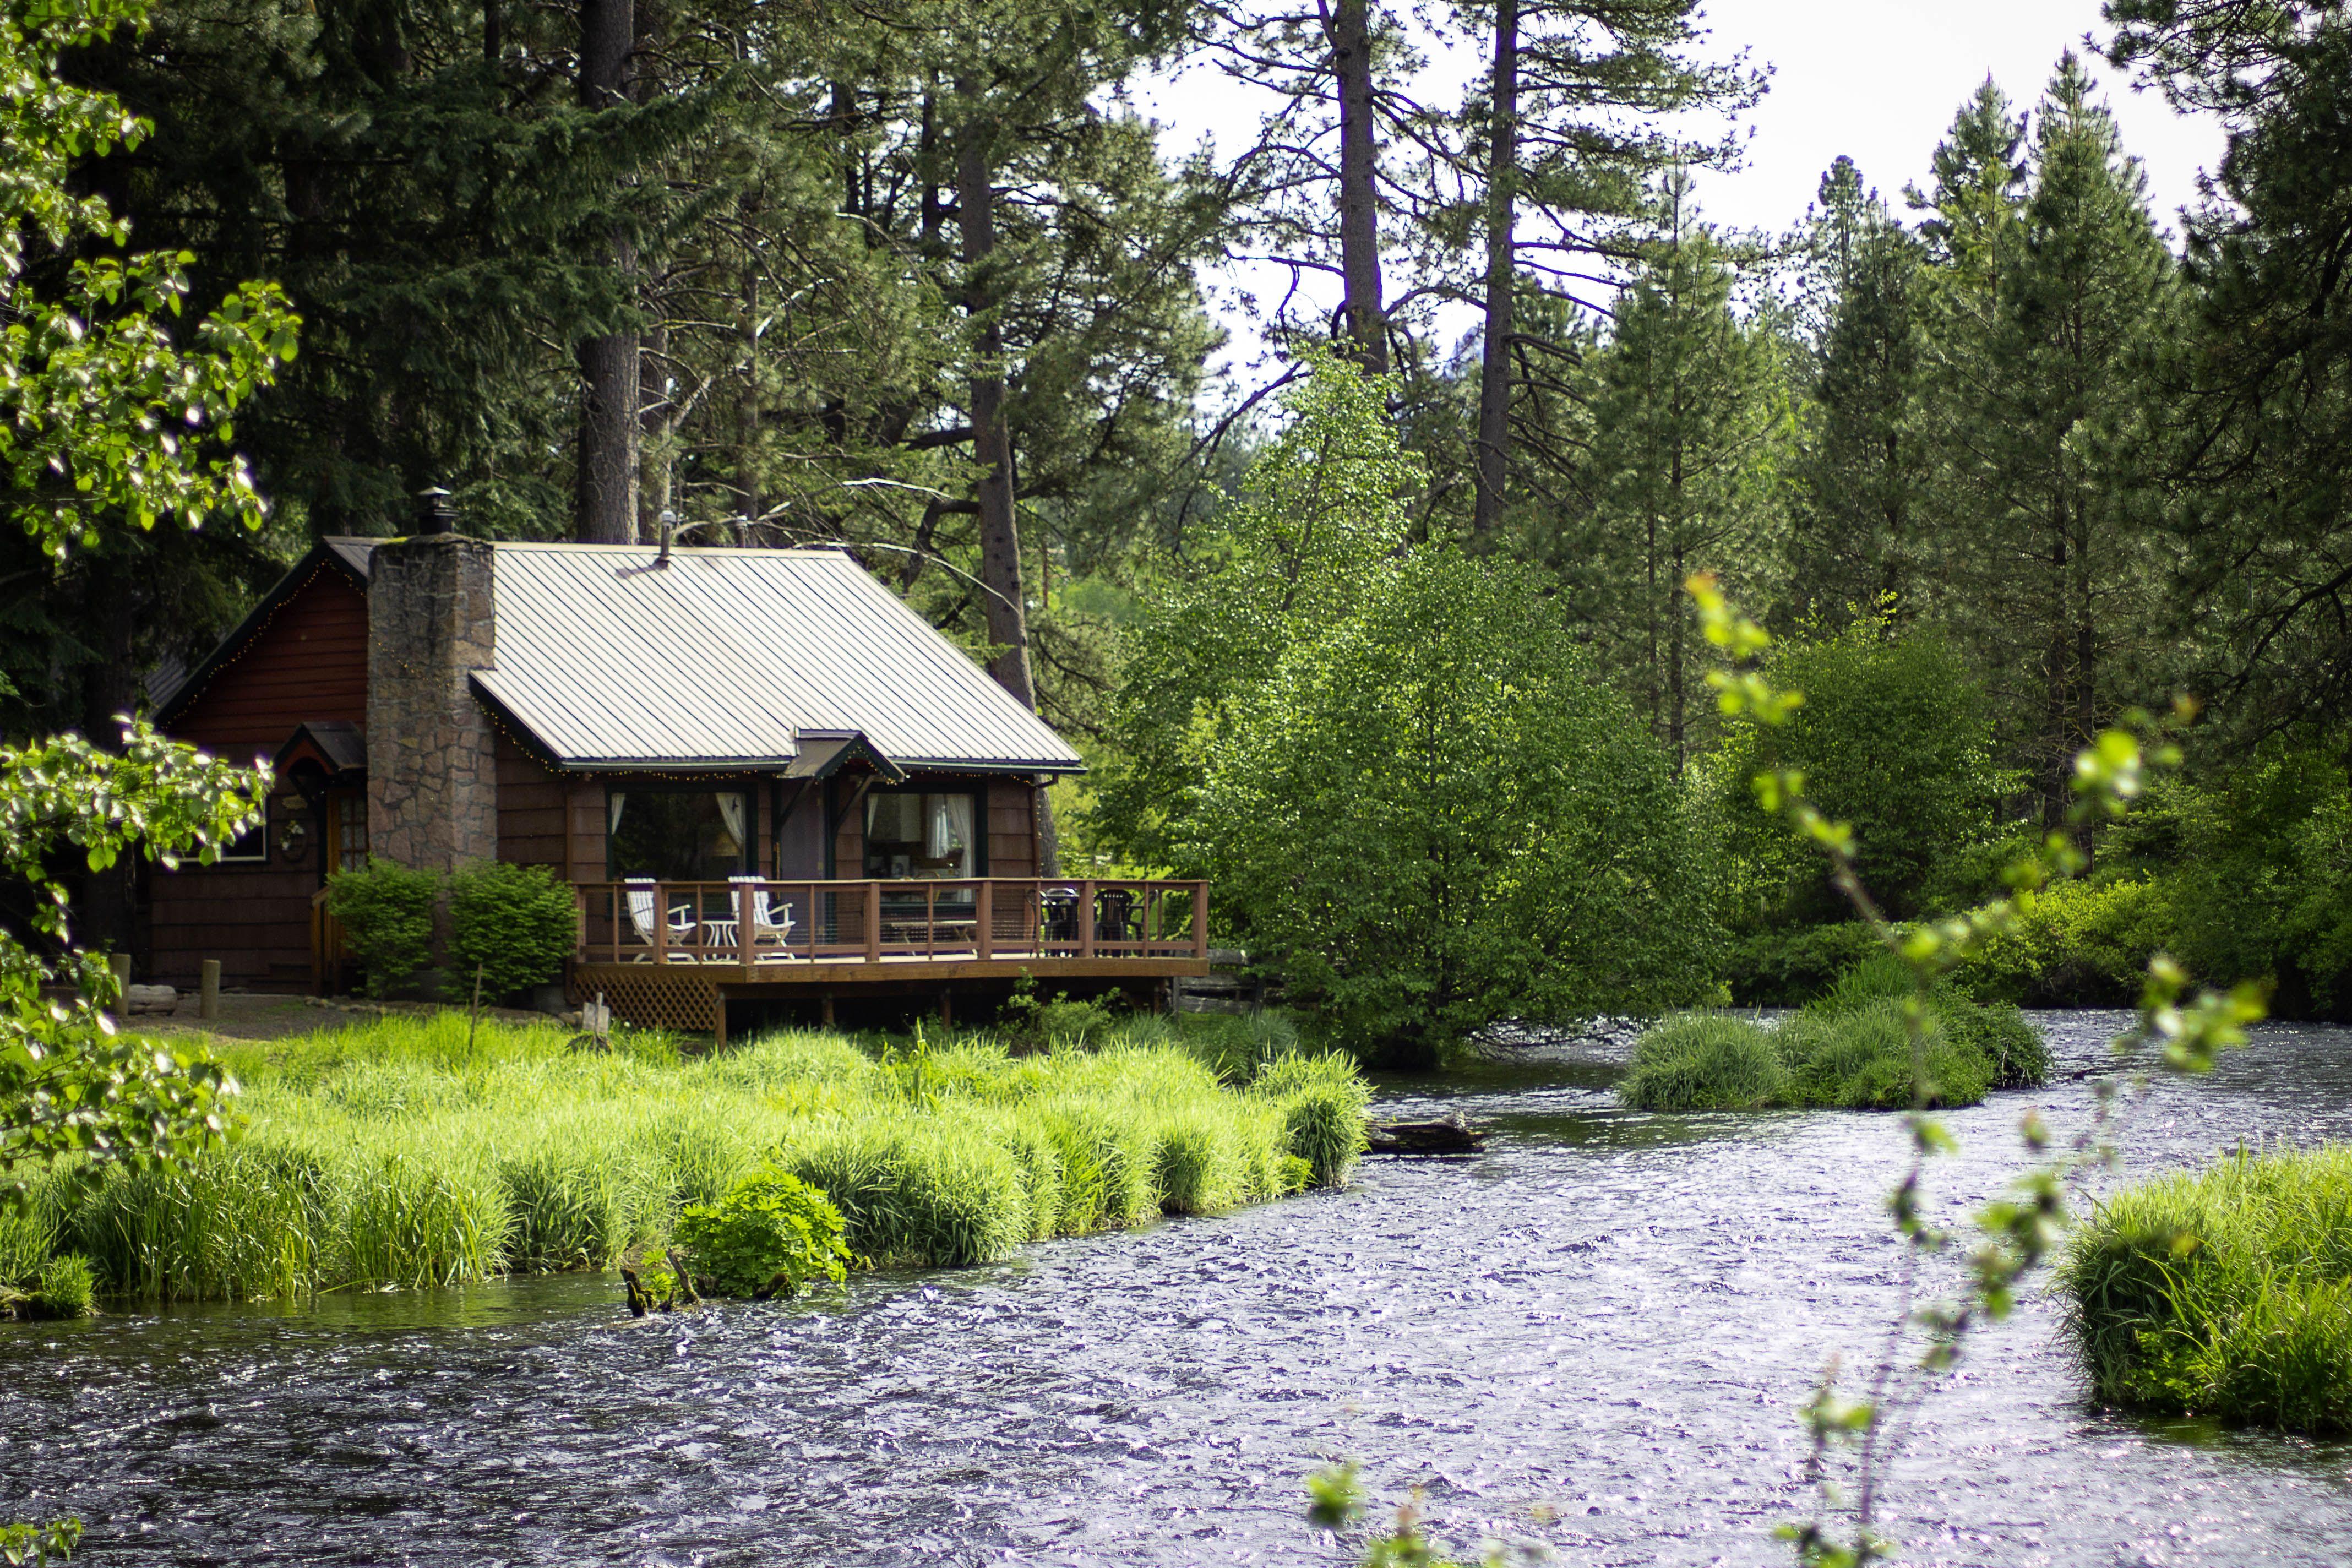 Metolius River Lodges Camp Sherman Oregon My Heart Has